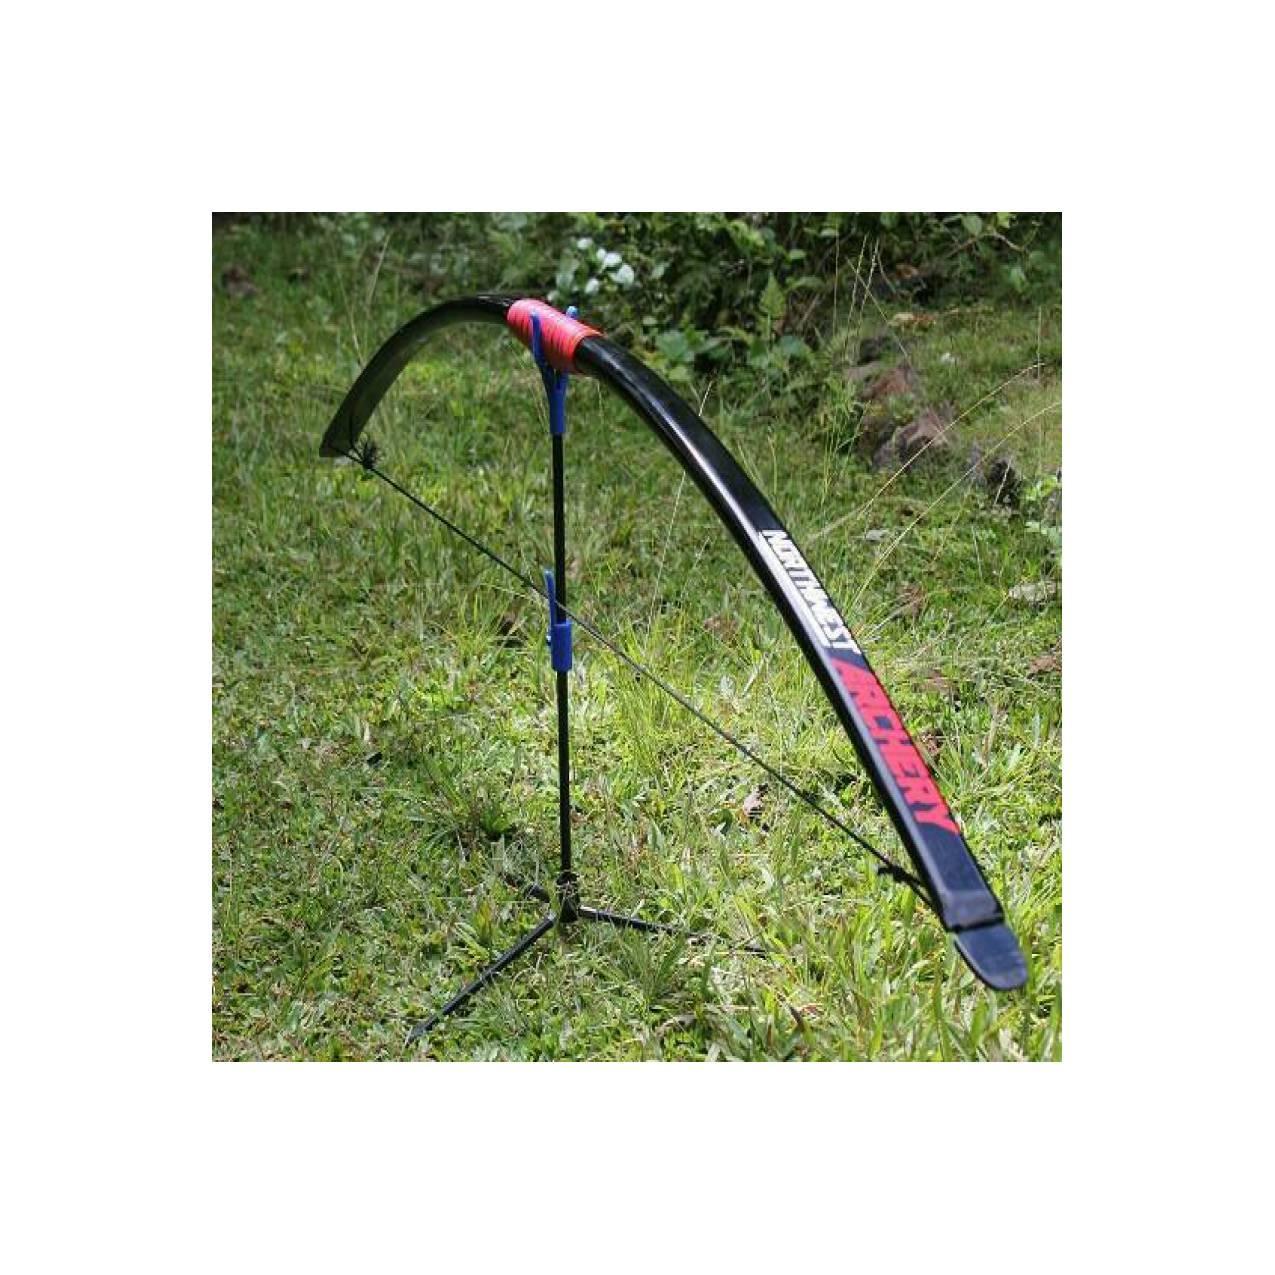 PANAHAN | LONGBOW 40lbs Archery | Panah | Busur | ( PREMIUM QUALITY )